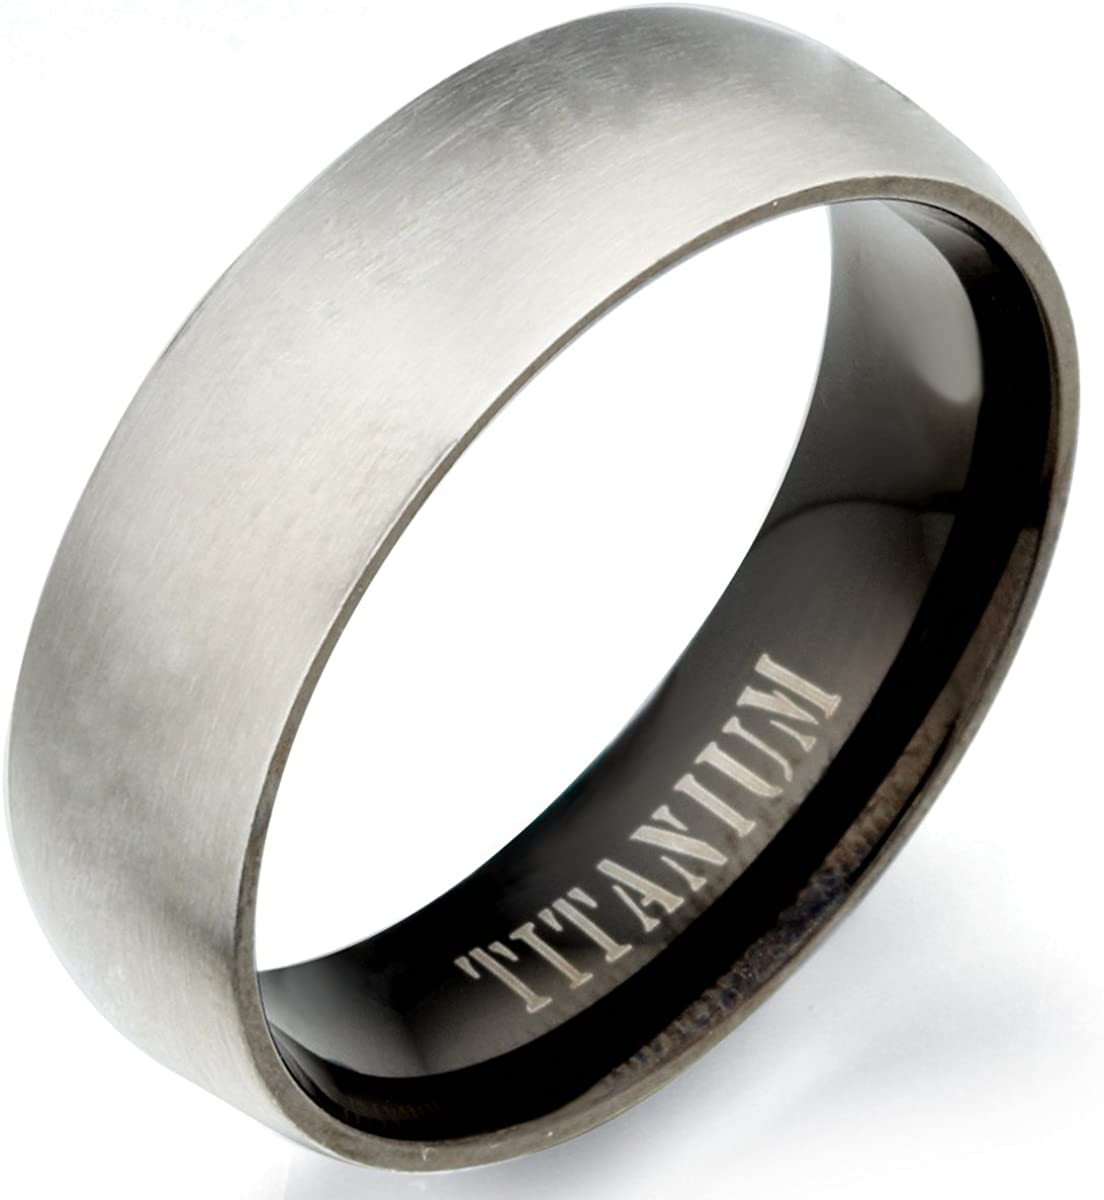 6 15.5 Women Ring Size Gemini Groom /& Bride Two Tone Black /& Silver Brush /& Polish Titanium Wedding Ring Set Width 7mm /& 5mm Men Ring Size